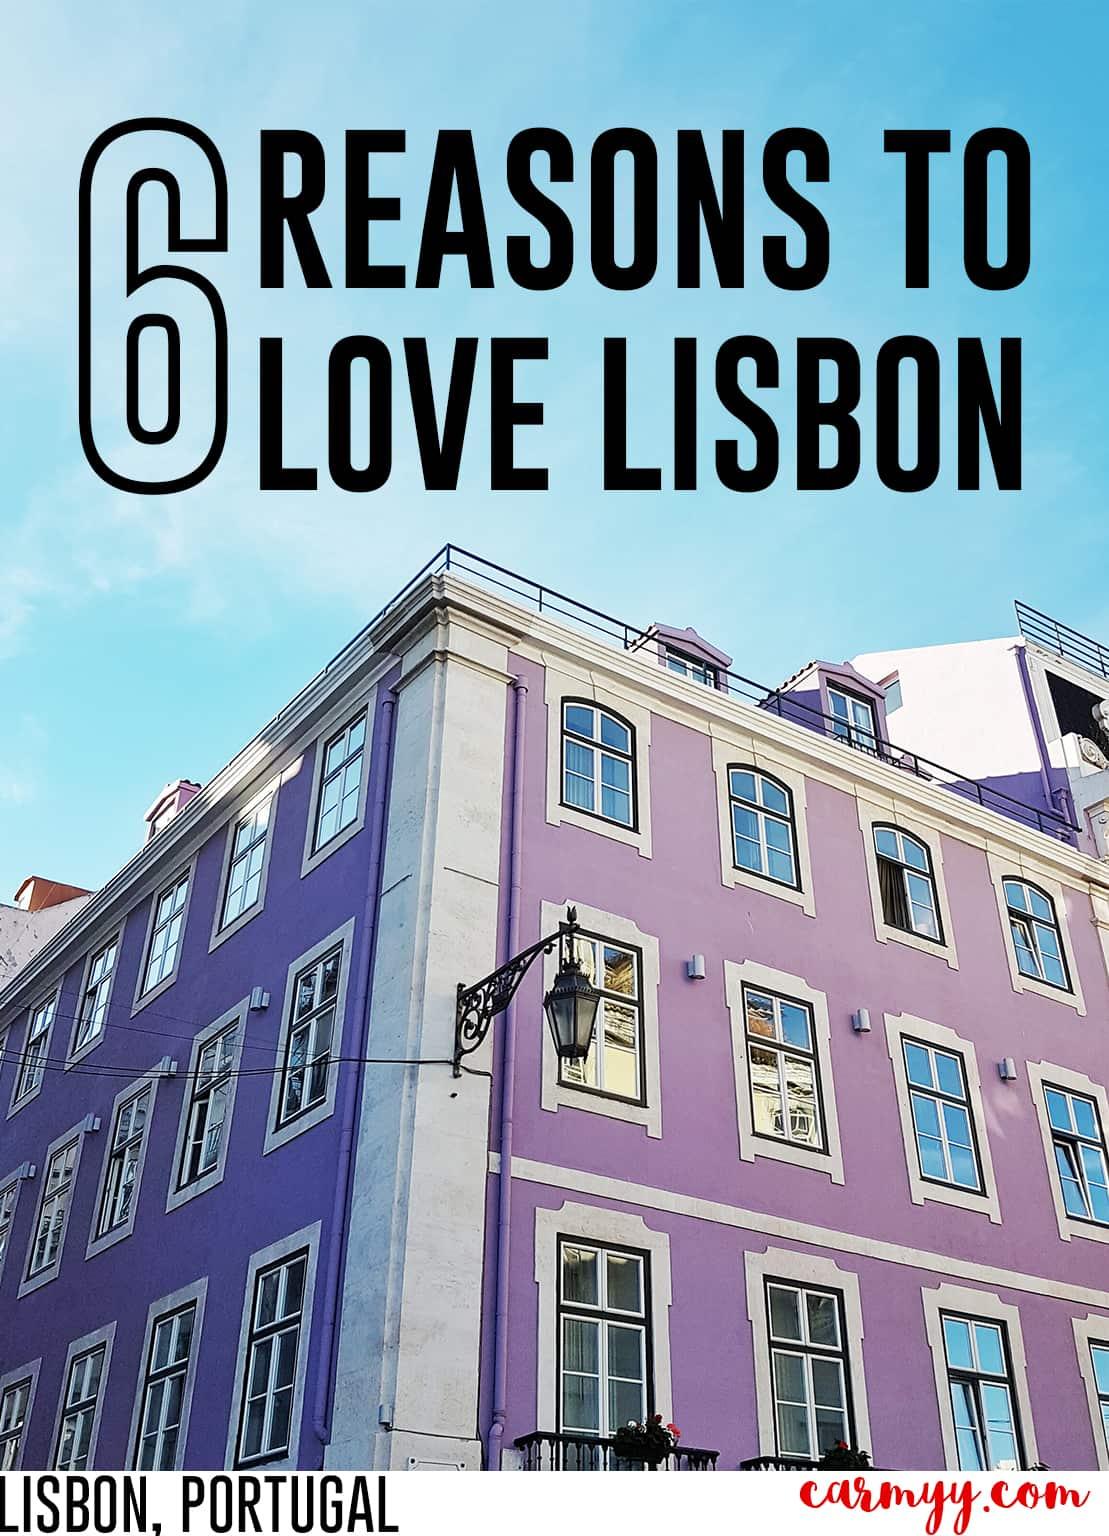 6 Reasons to Love Lisbon, Portugal! www.carmyy.com